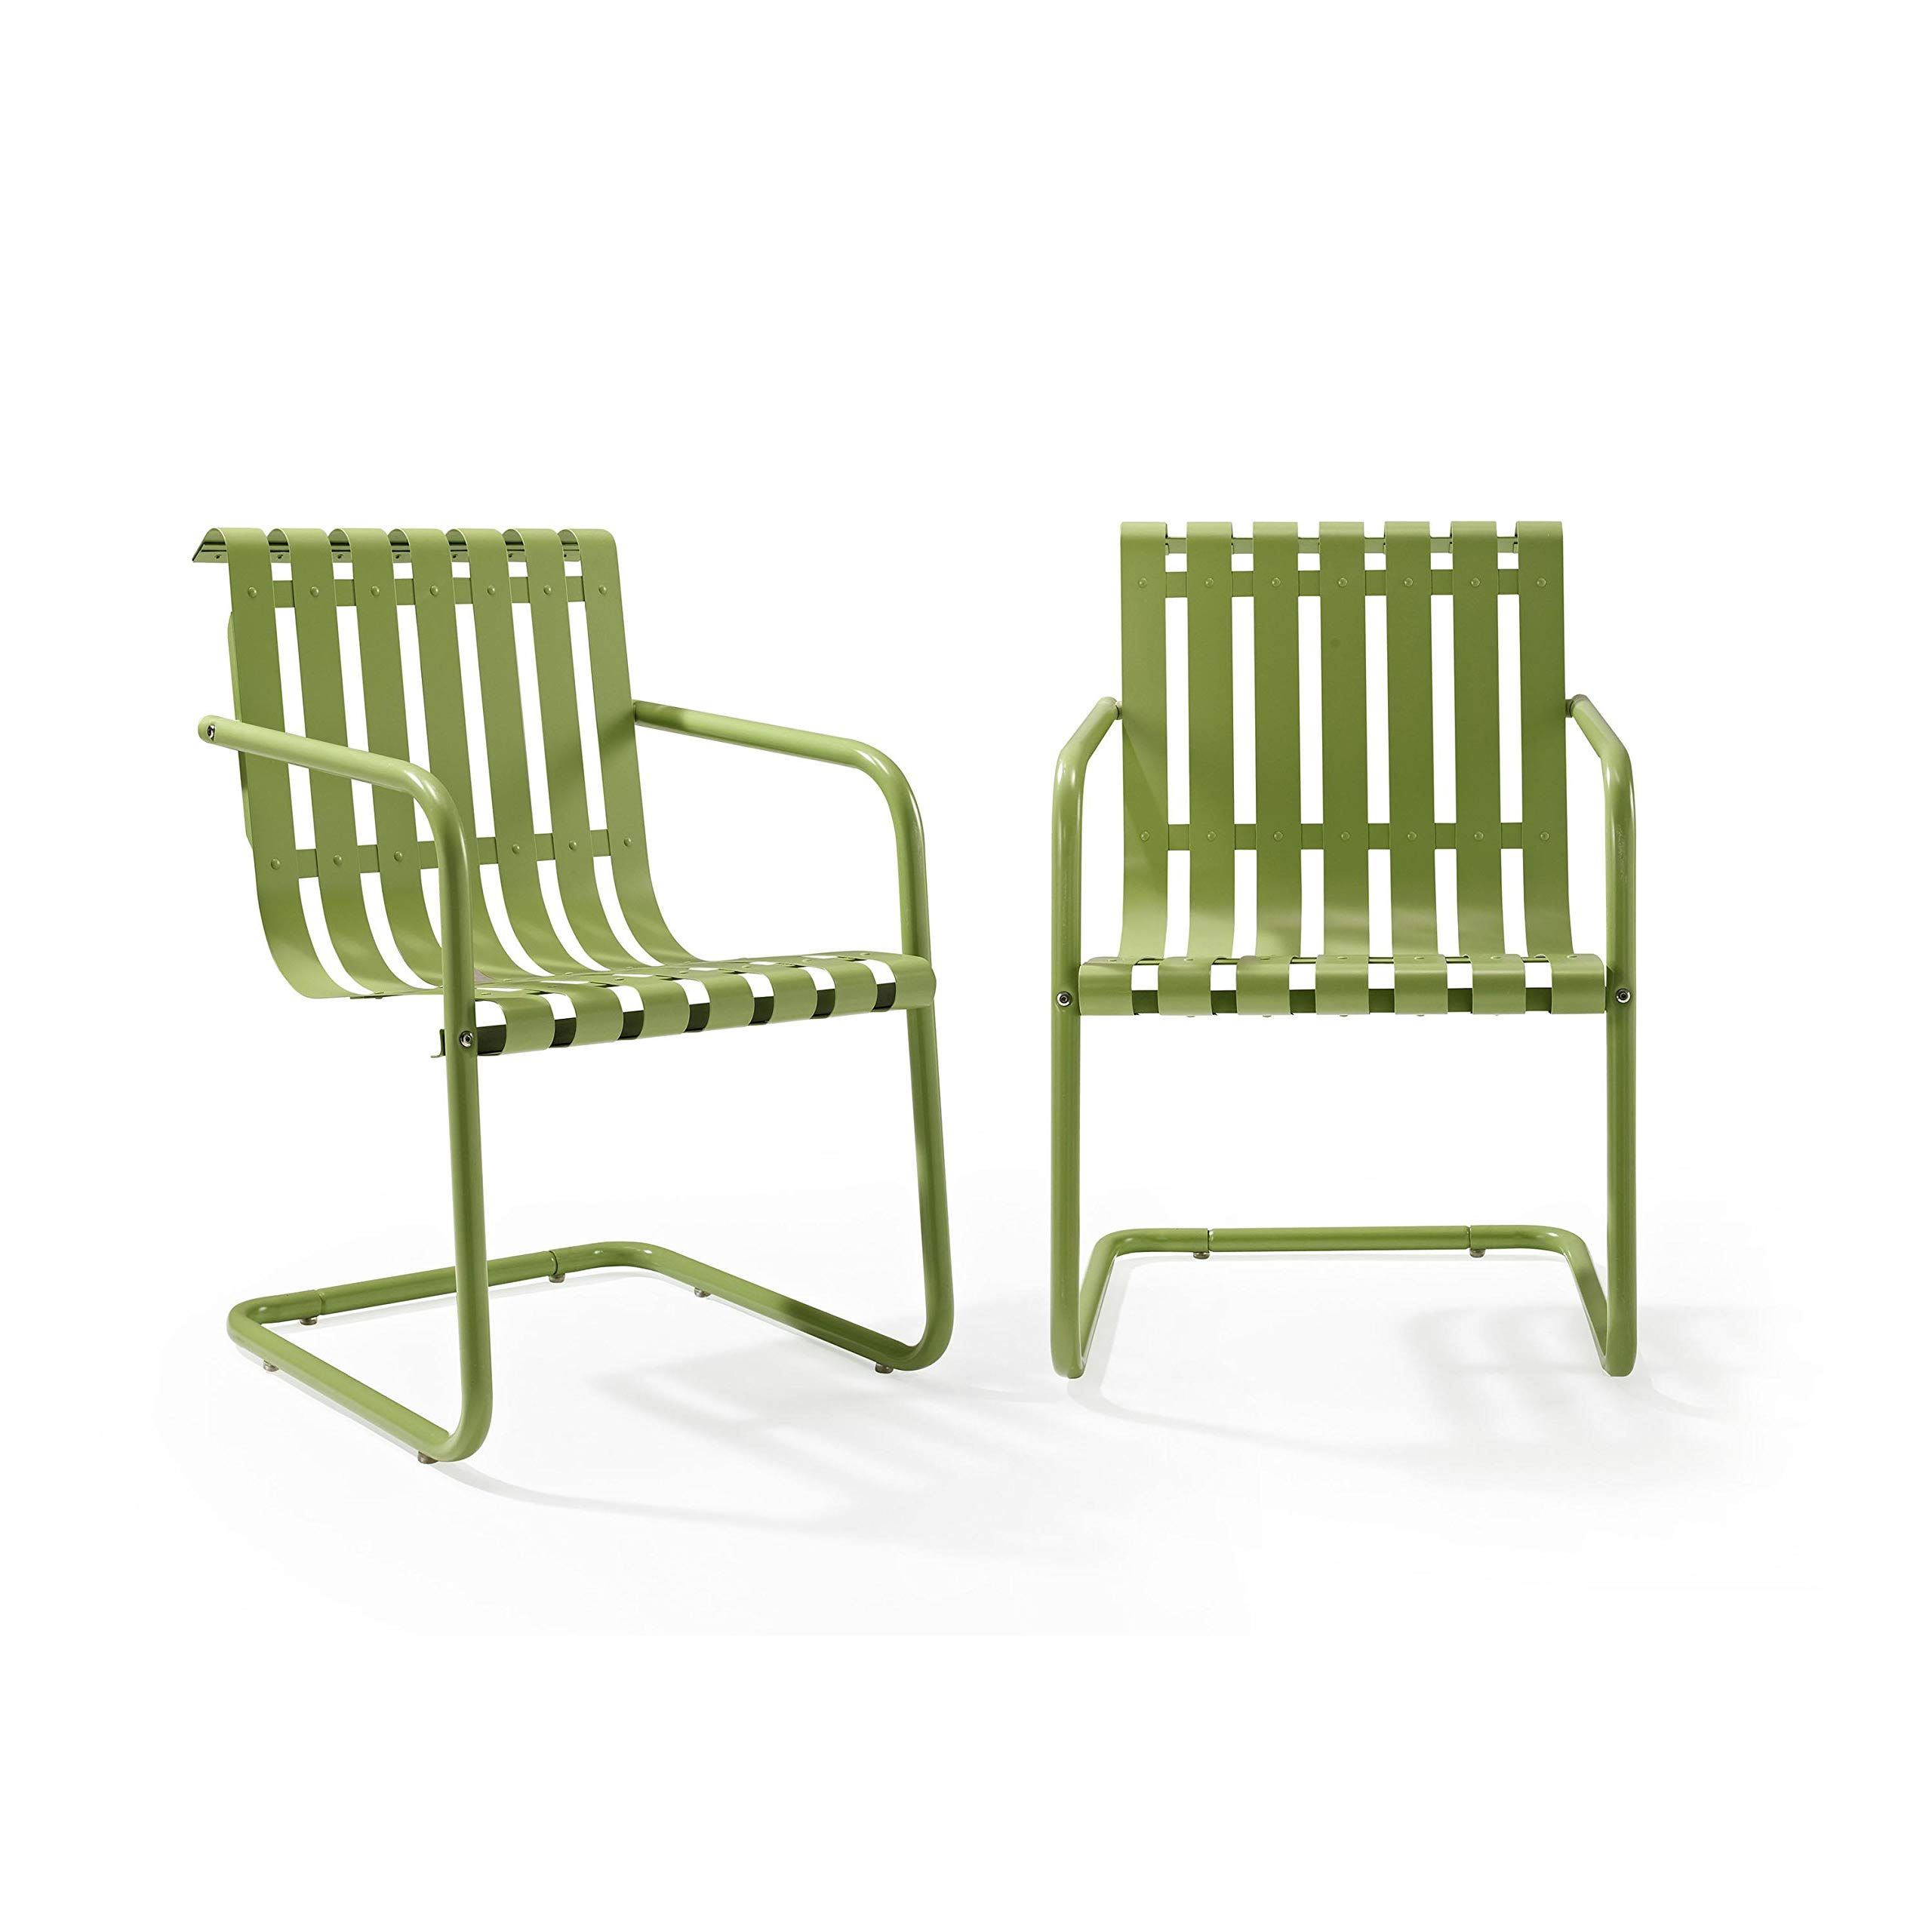 Crosley Furniture Gracie Retro Metal Outdoor Spring Chair - Oasis Green (Set of 2) by Crosley Furniture